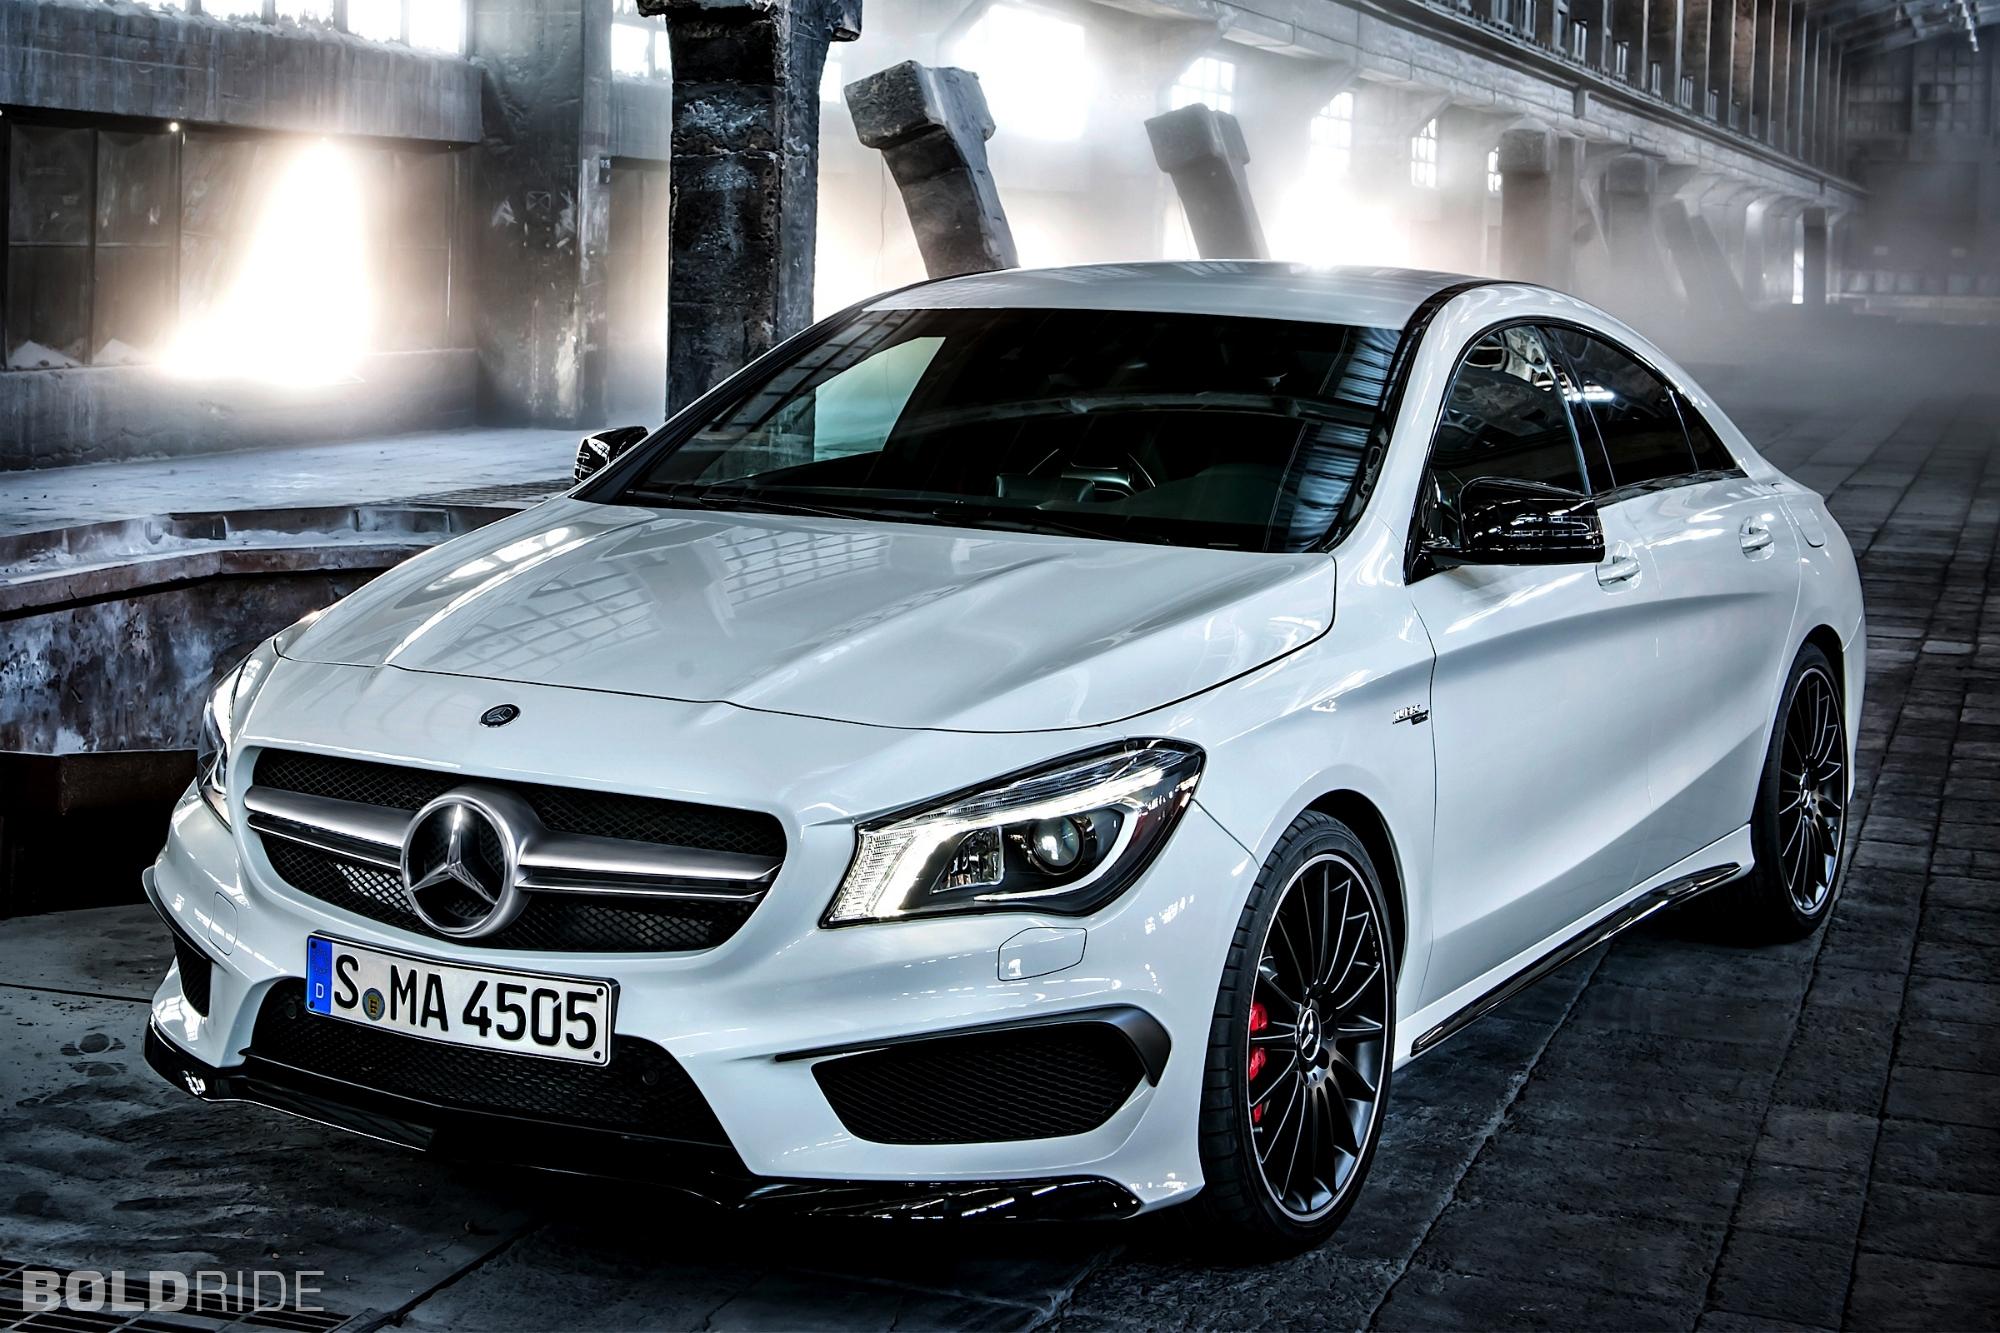 2014 Mercedes-Benz CLA45 AMG 1280 x 1080